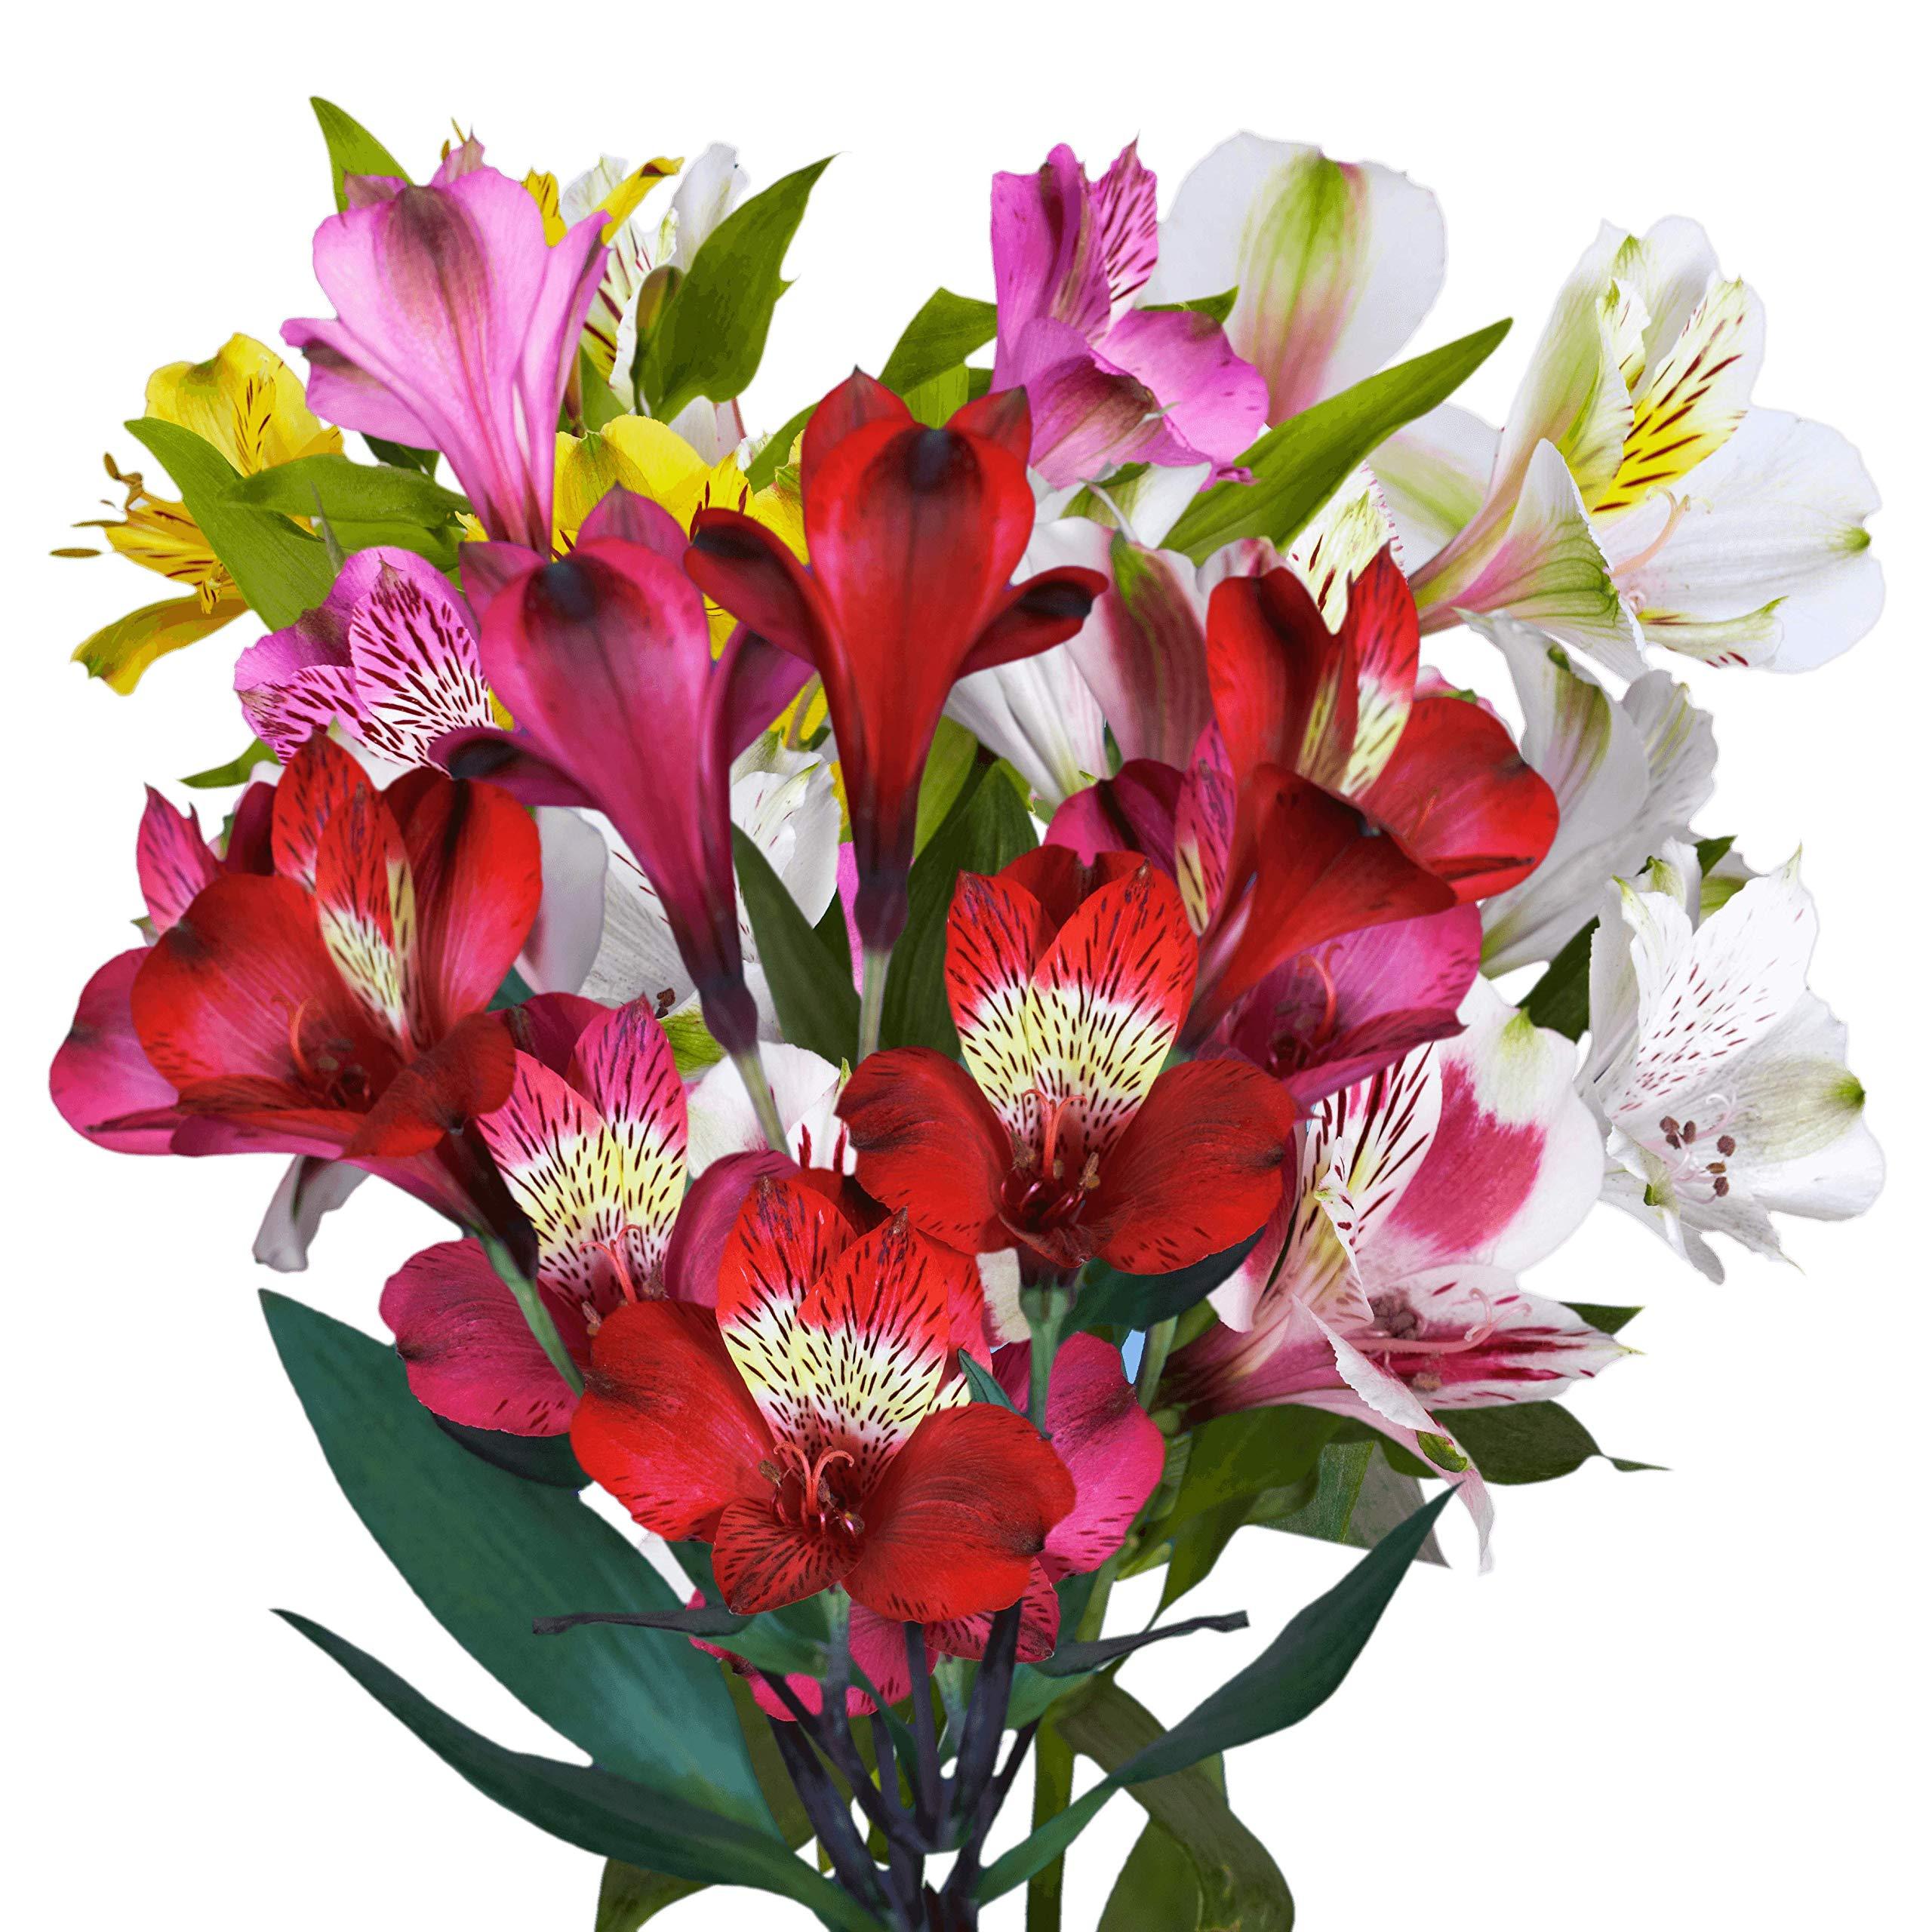 GlobalRose 100 Fresh Cut Assorted Alstroemeria Flowers - Fancy Alstroemeria - Fresh Flowers For Birthdays, Weddings or Anniversary.